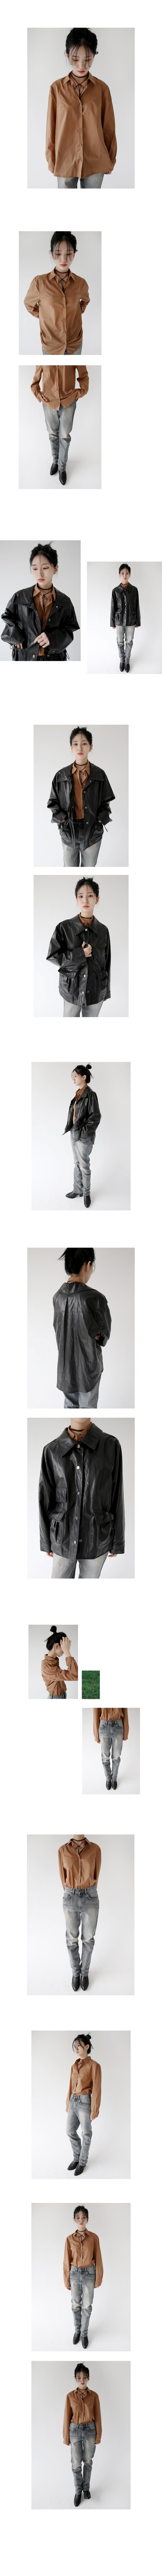 shoulder pintuck detail shirts